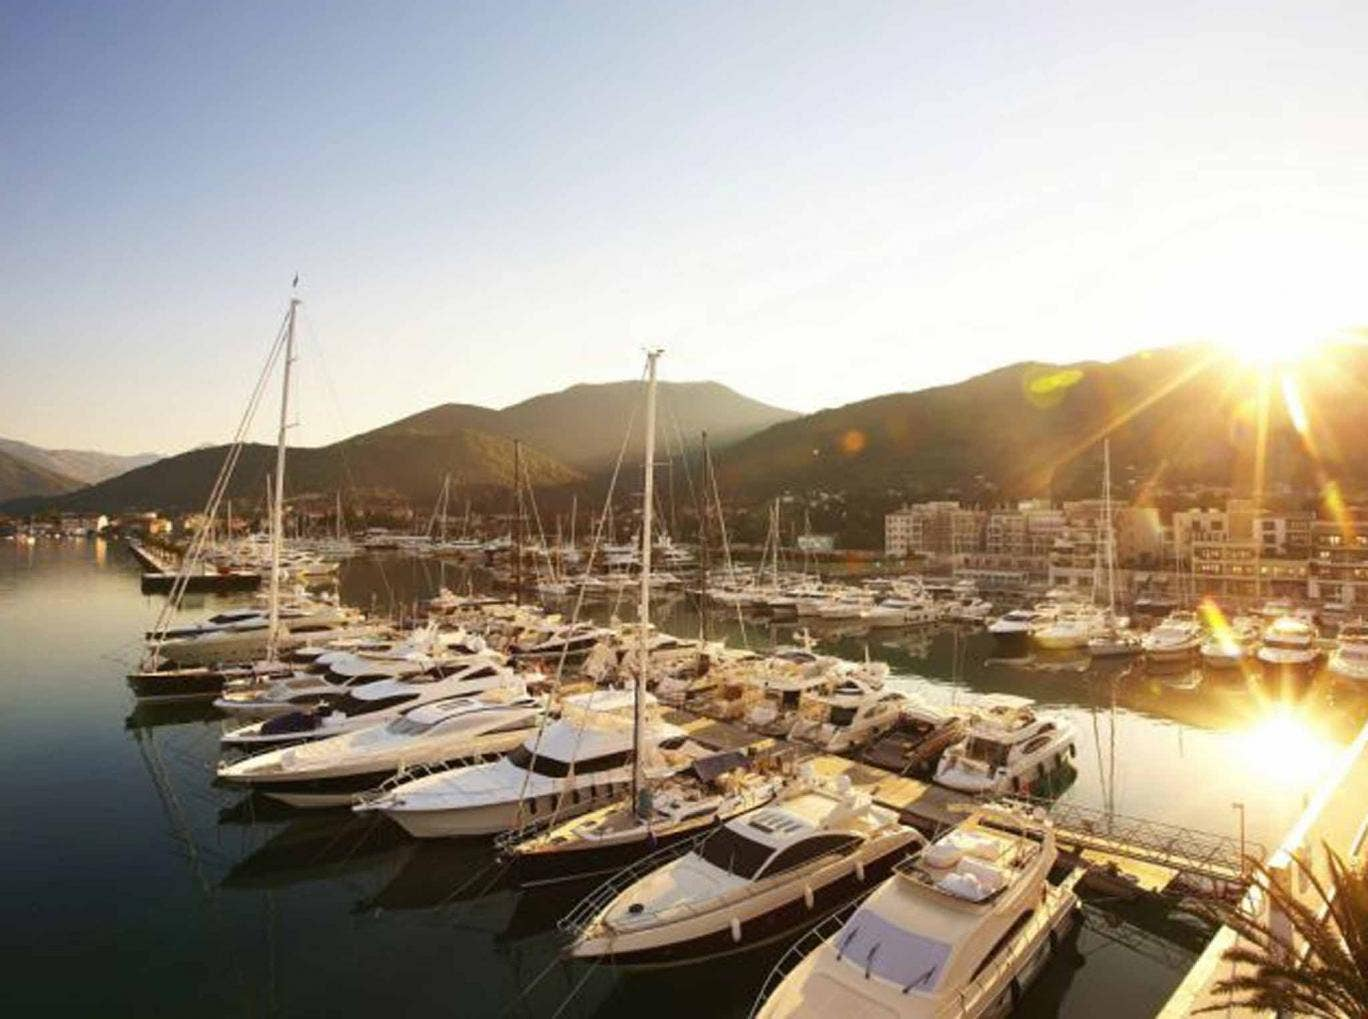 Take a view: Porto Montenegro